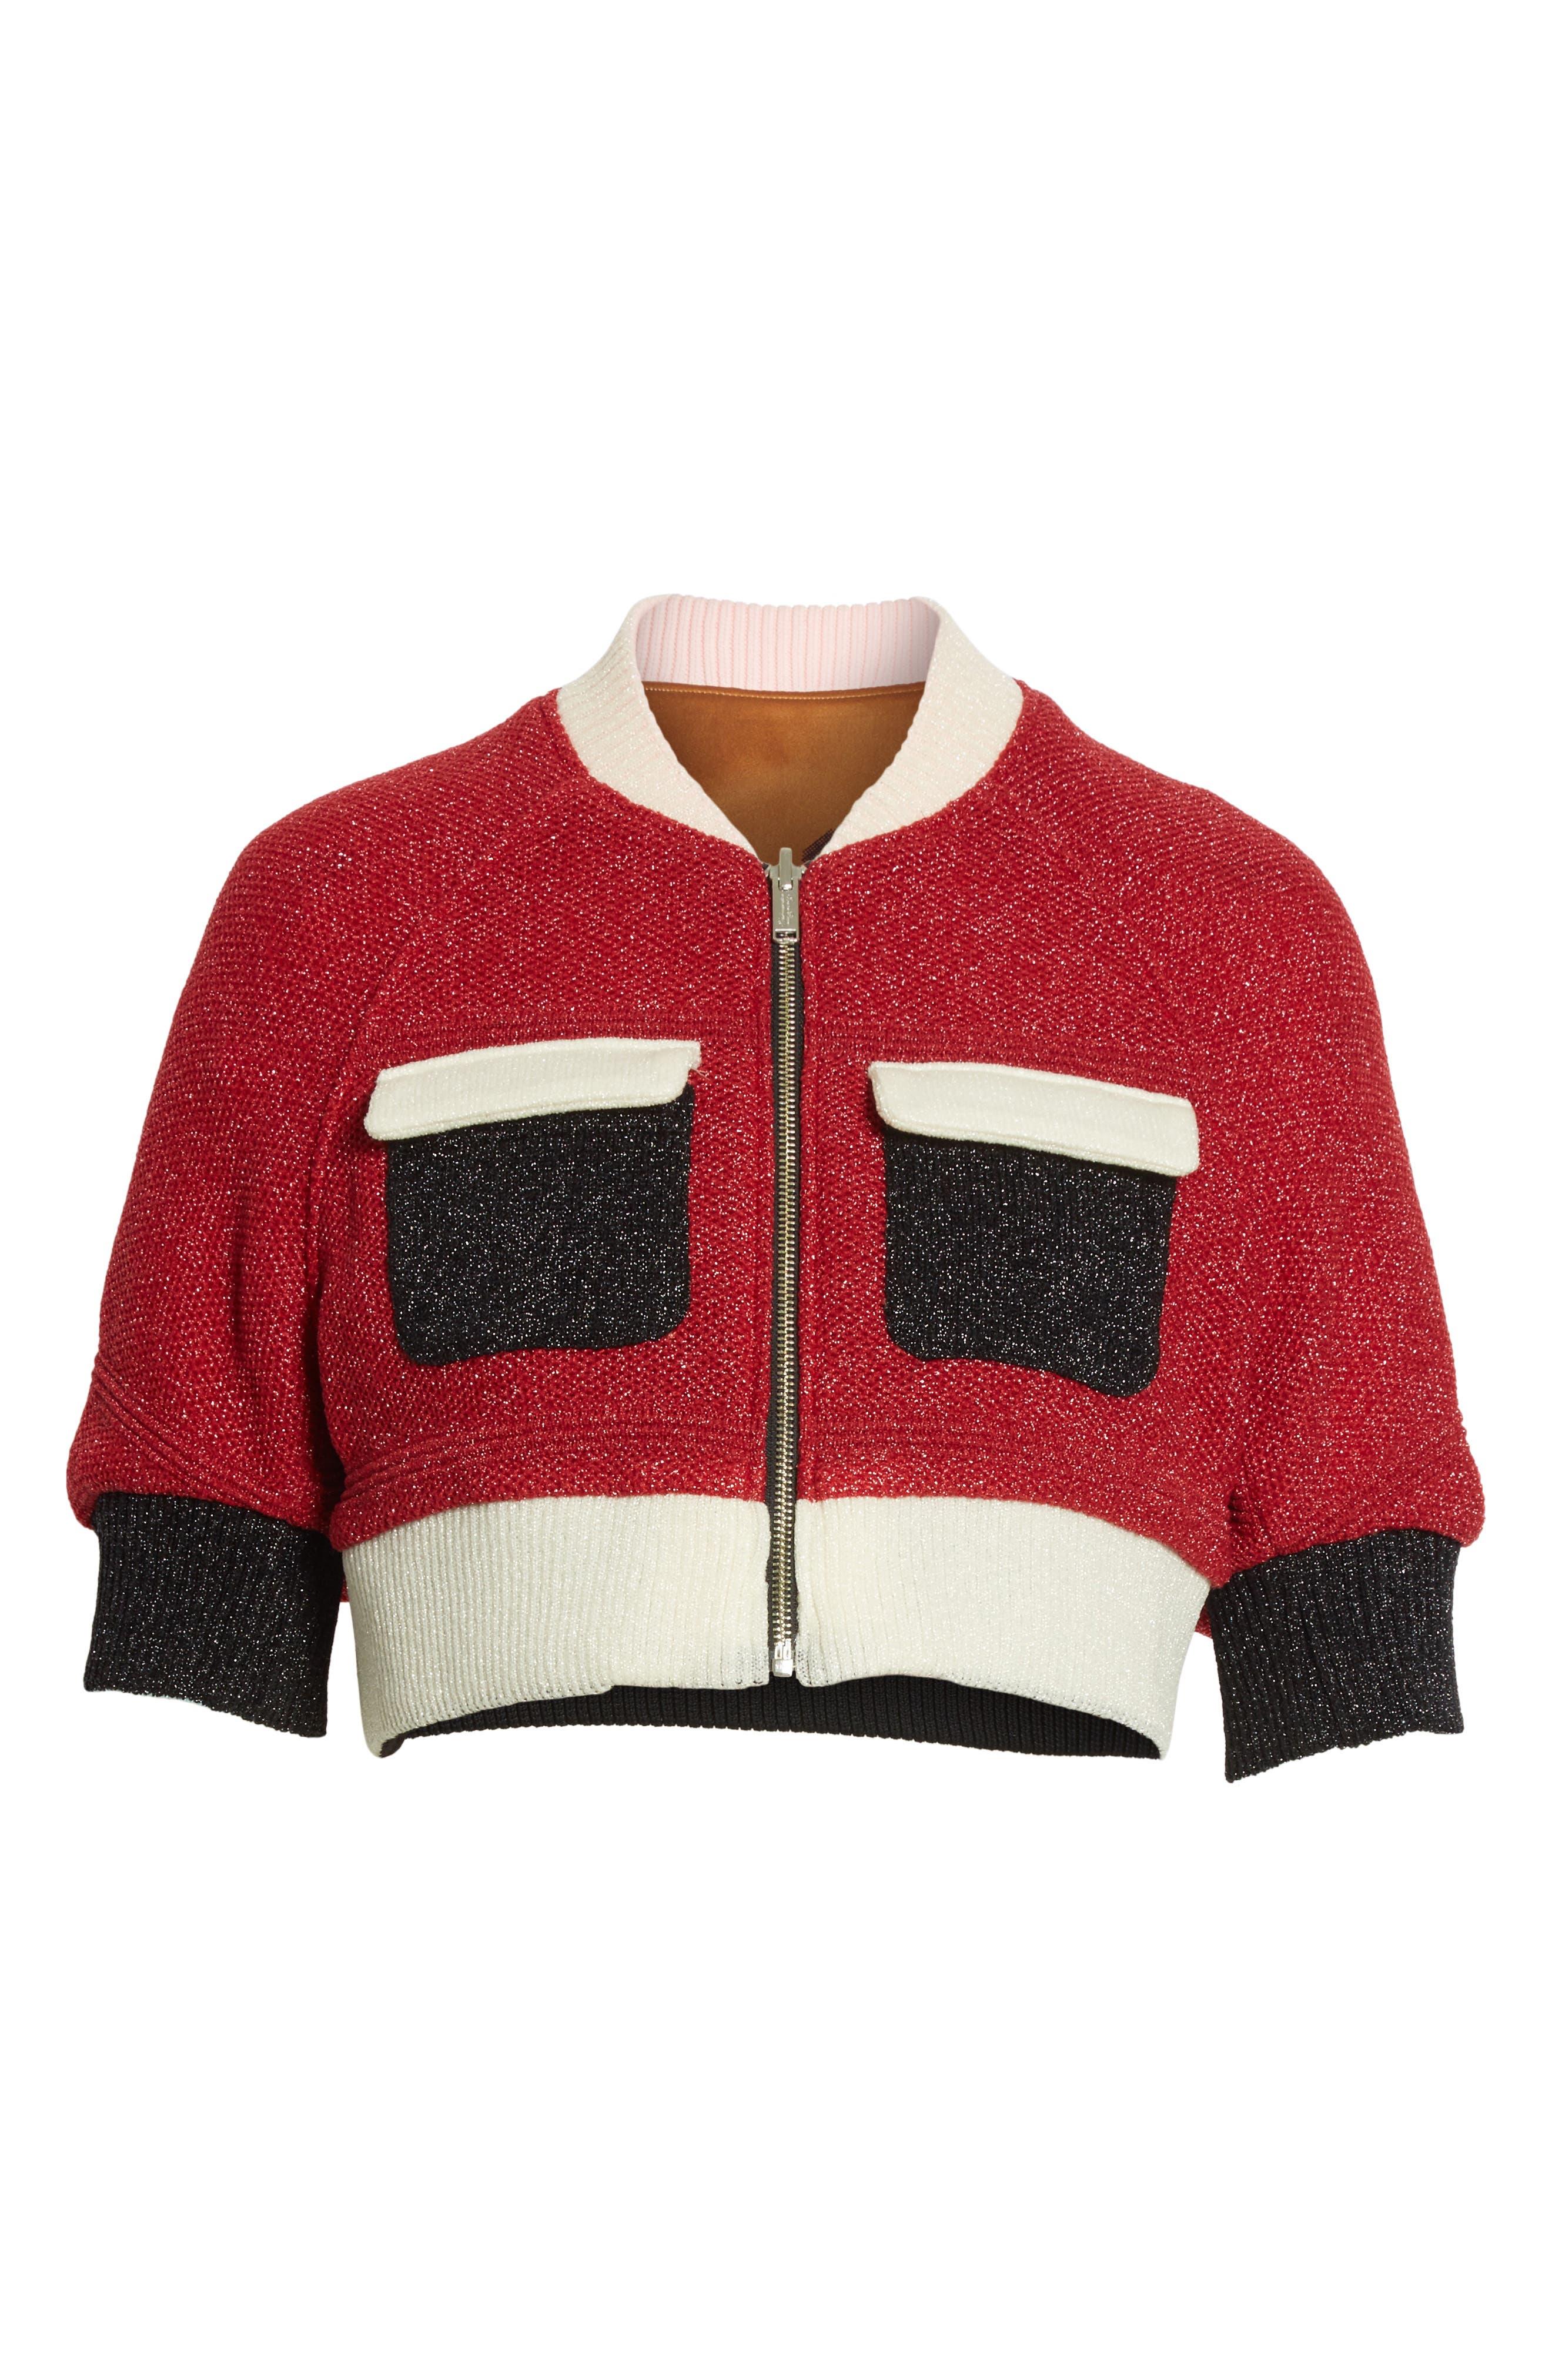 Reversible Crop Jacket,                             Alternate thumbnail 6, color,                             600